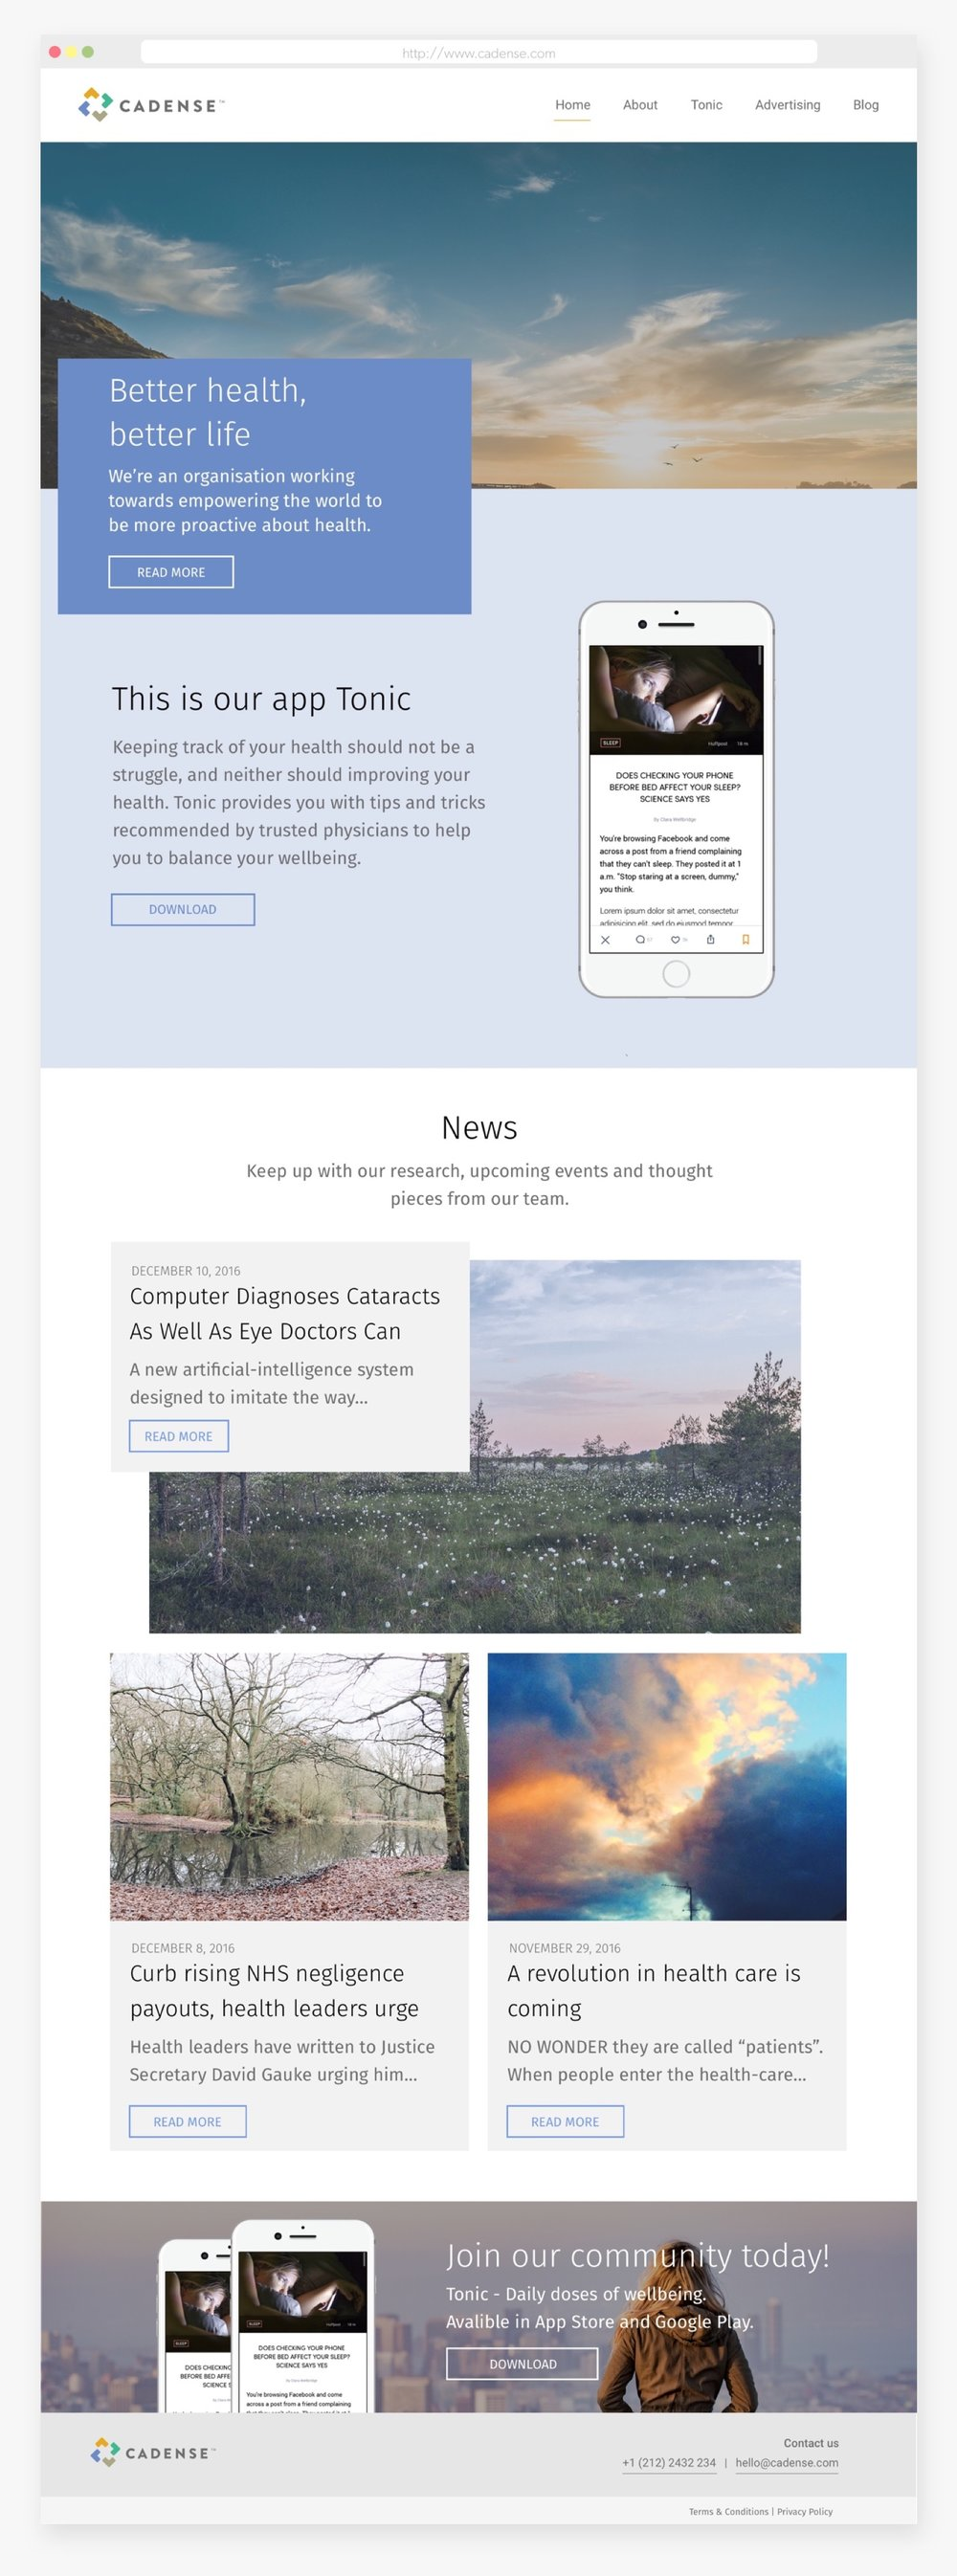 Tonic-Cadense-marketing-page-design-furtnermore-studio.jpg